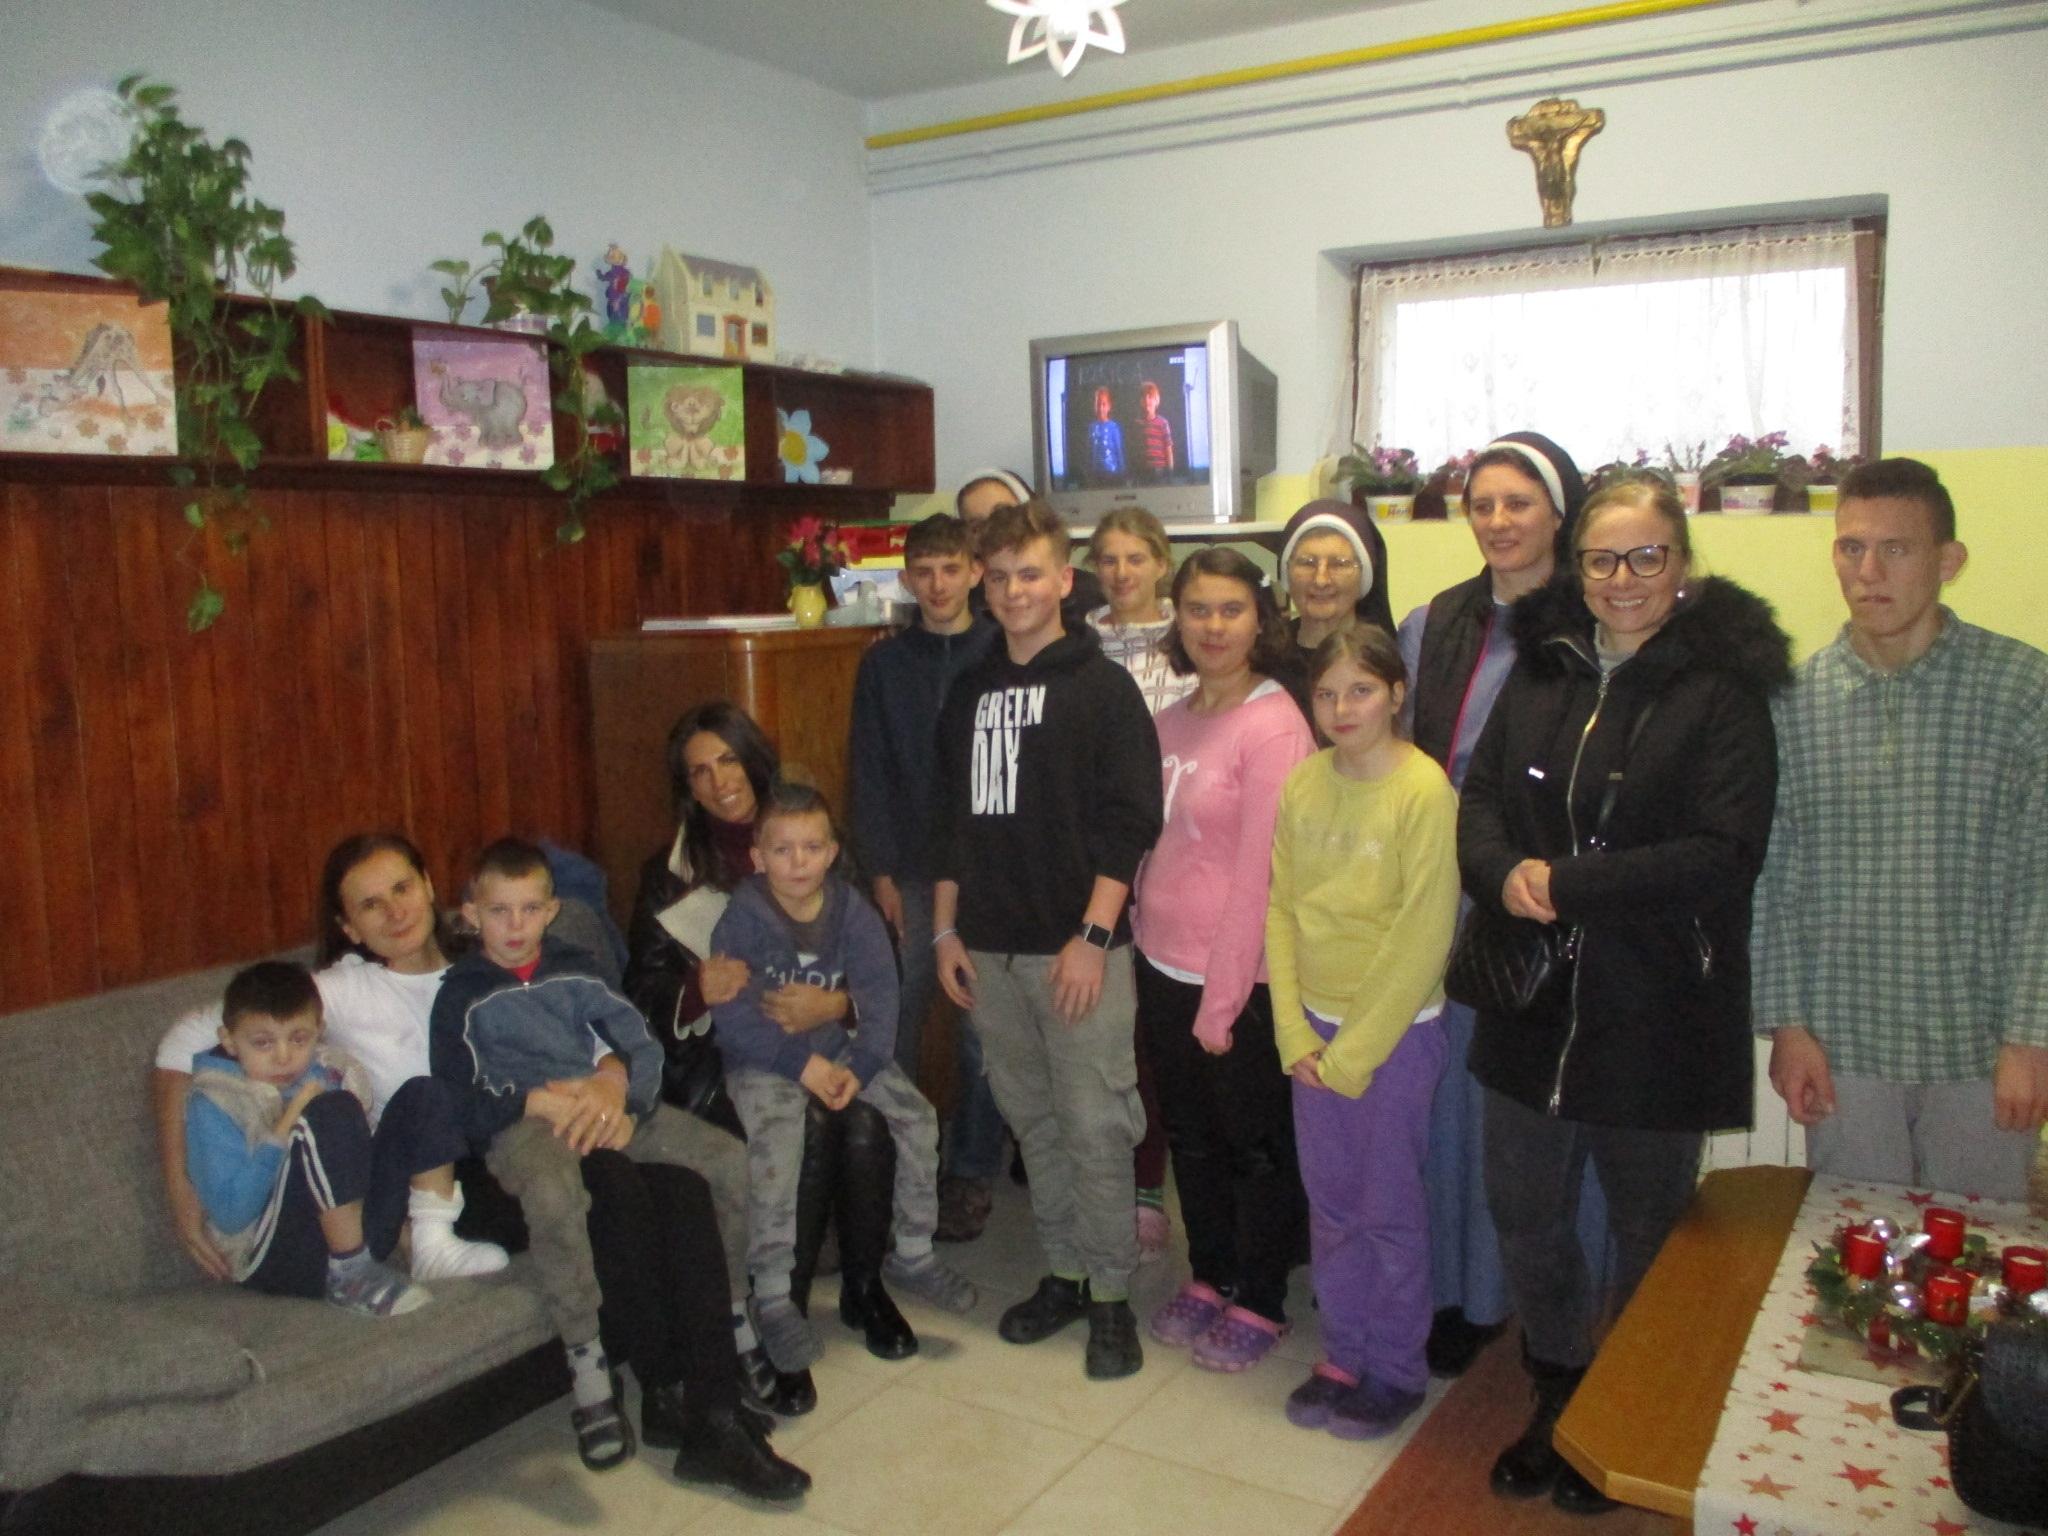 Modna dizajnerica Kristina Jelenić Burja darovala djecu u domu časnih sestara Bazilijanki u Križevcima